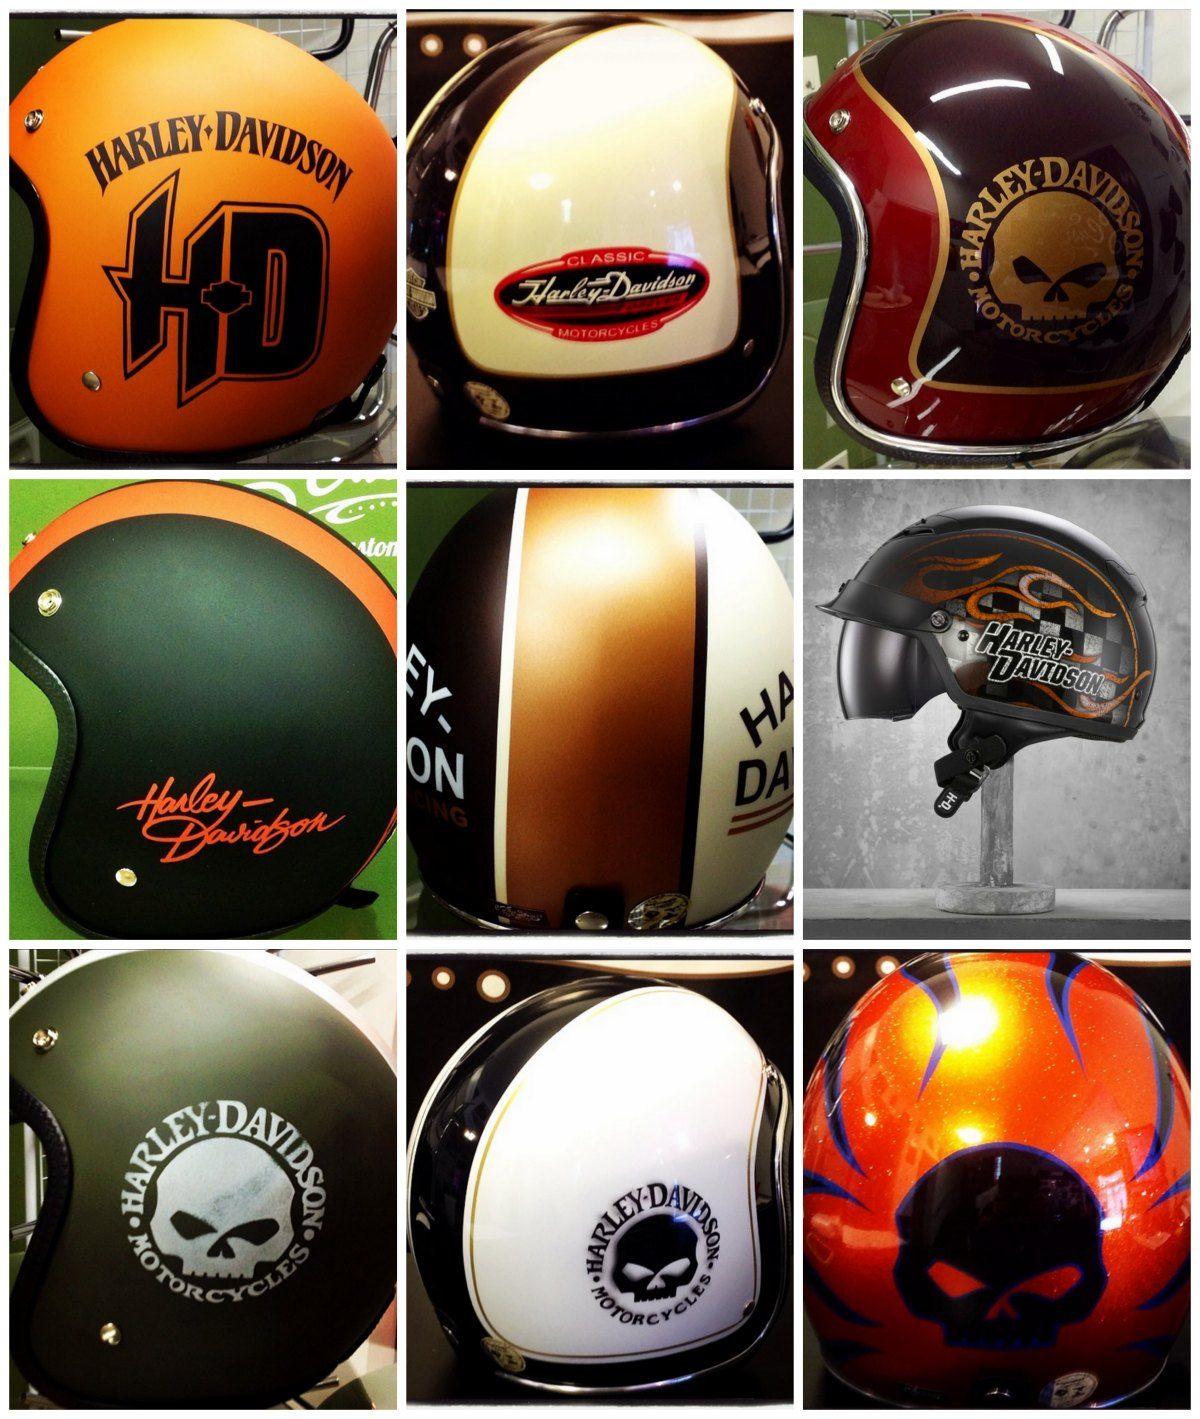 Harley Davidson Motorcycle Helmets For Men And Women In 2017 Harley Helmets Harley Davidson Helmets Motorcycle Helmets